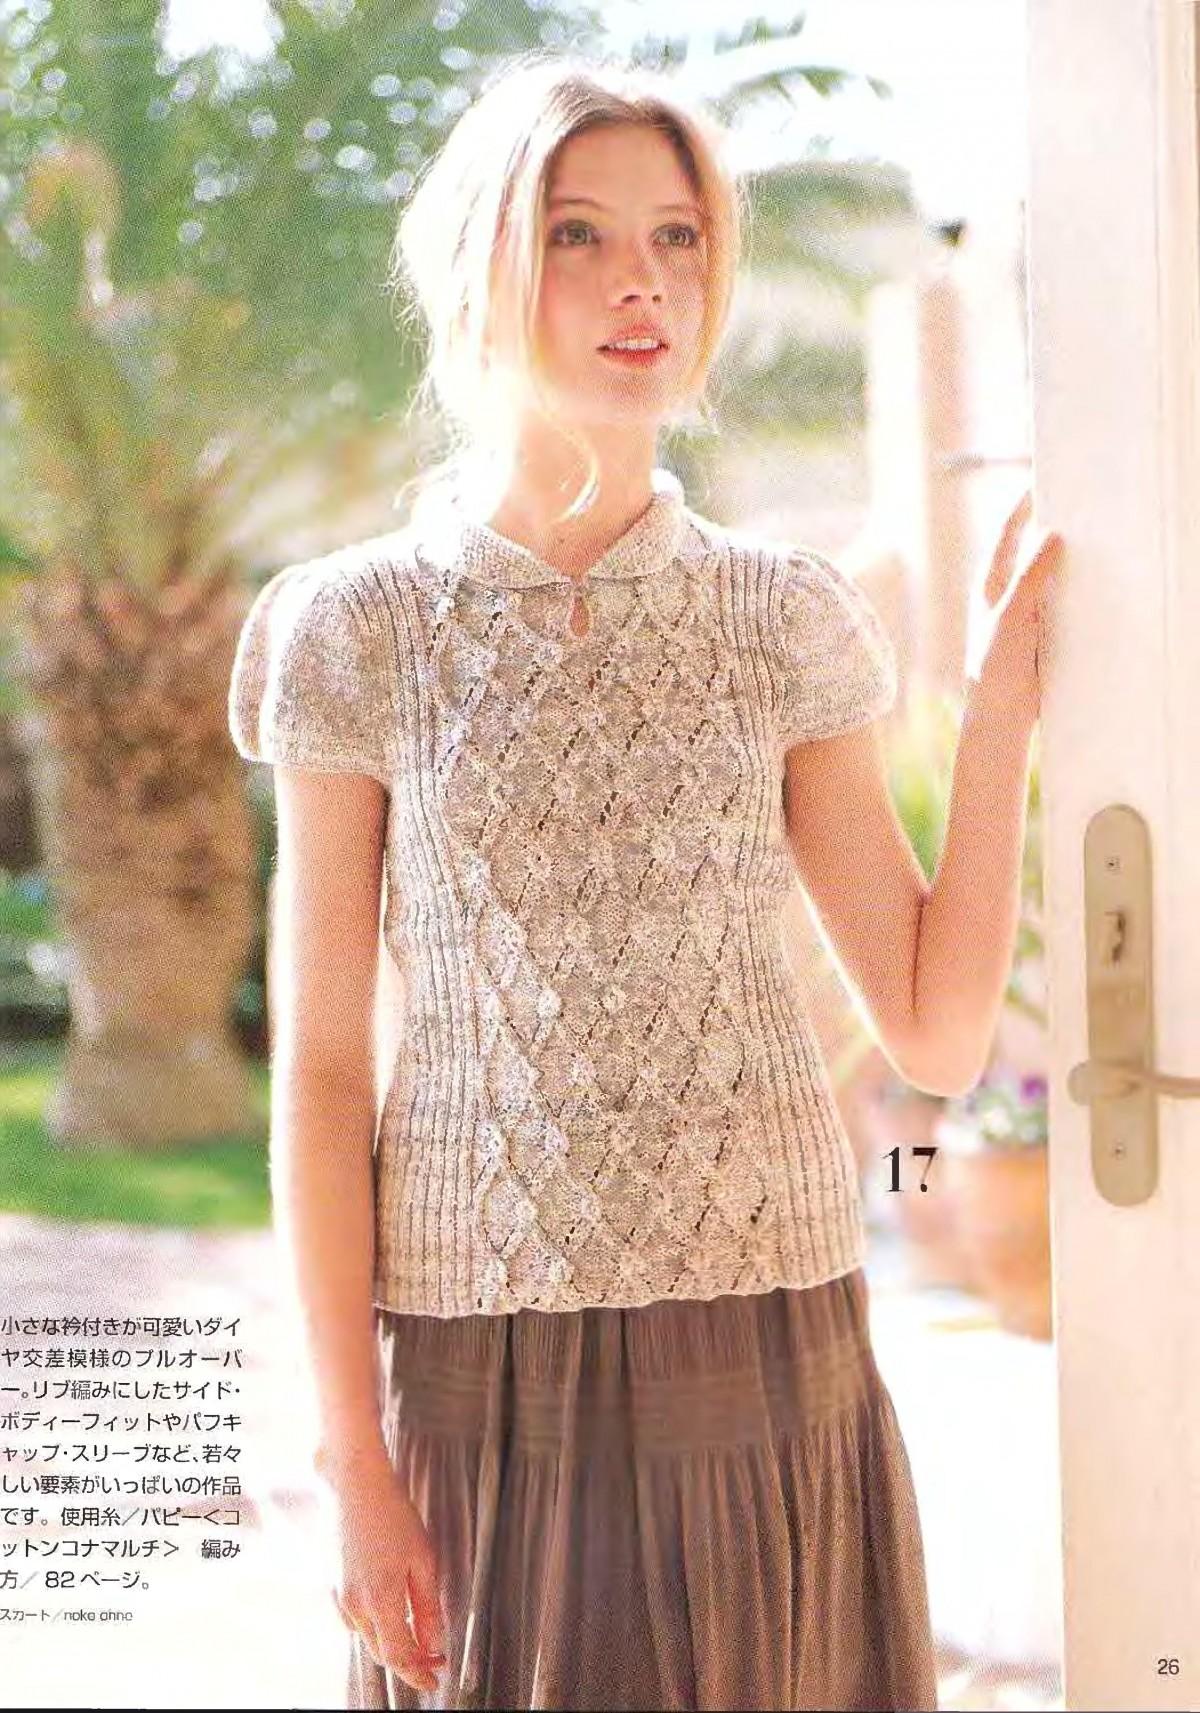 Lets-knit-series-NV4359-2008-Spring-Summer-sp-kr_24.jpg